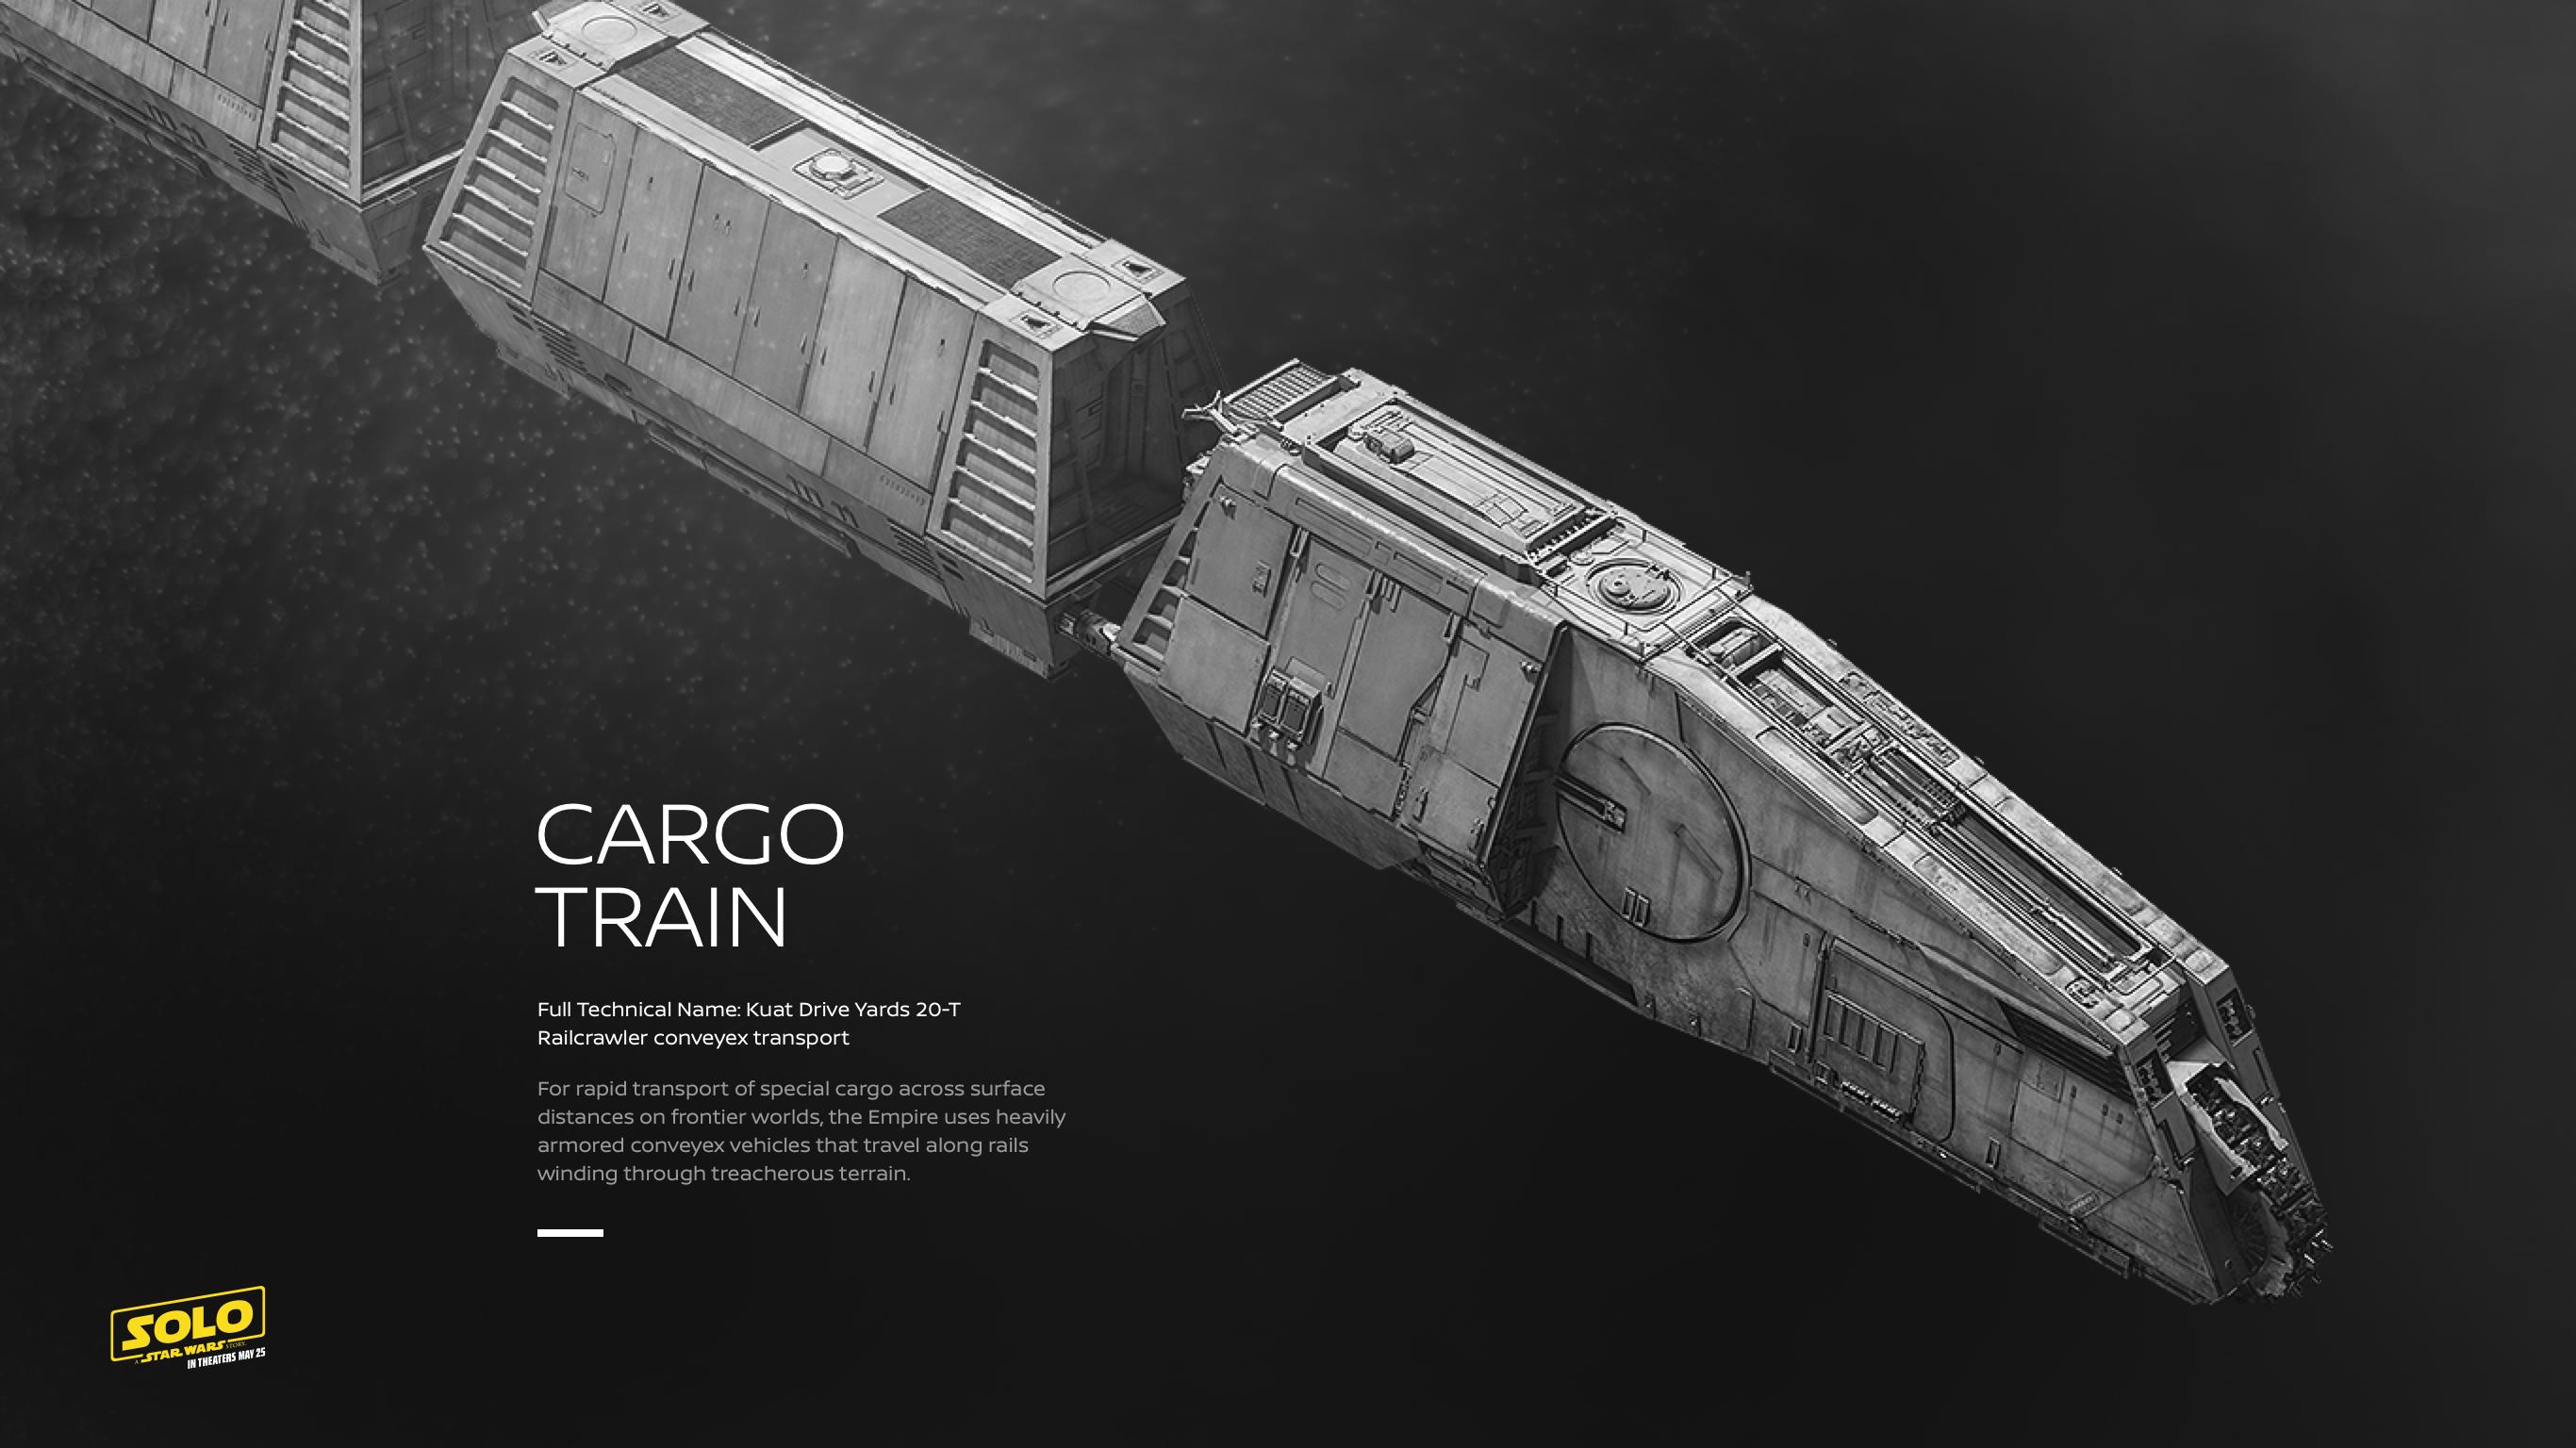 INSPIRATION – CARGO TRAIN